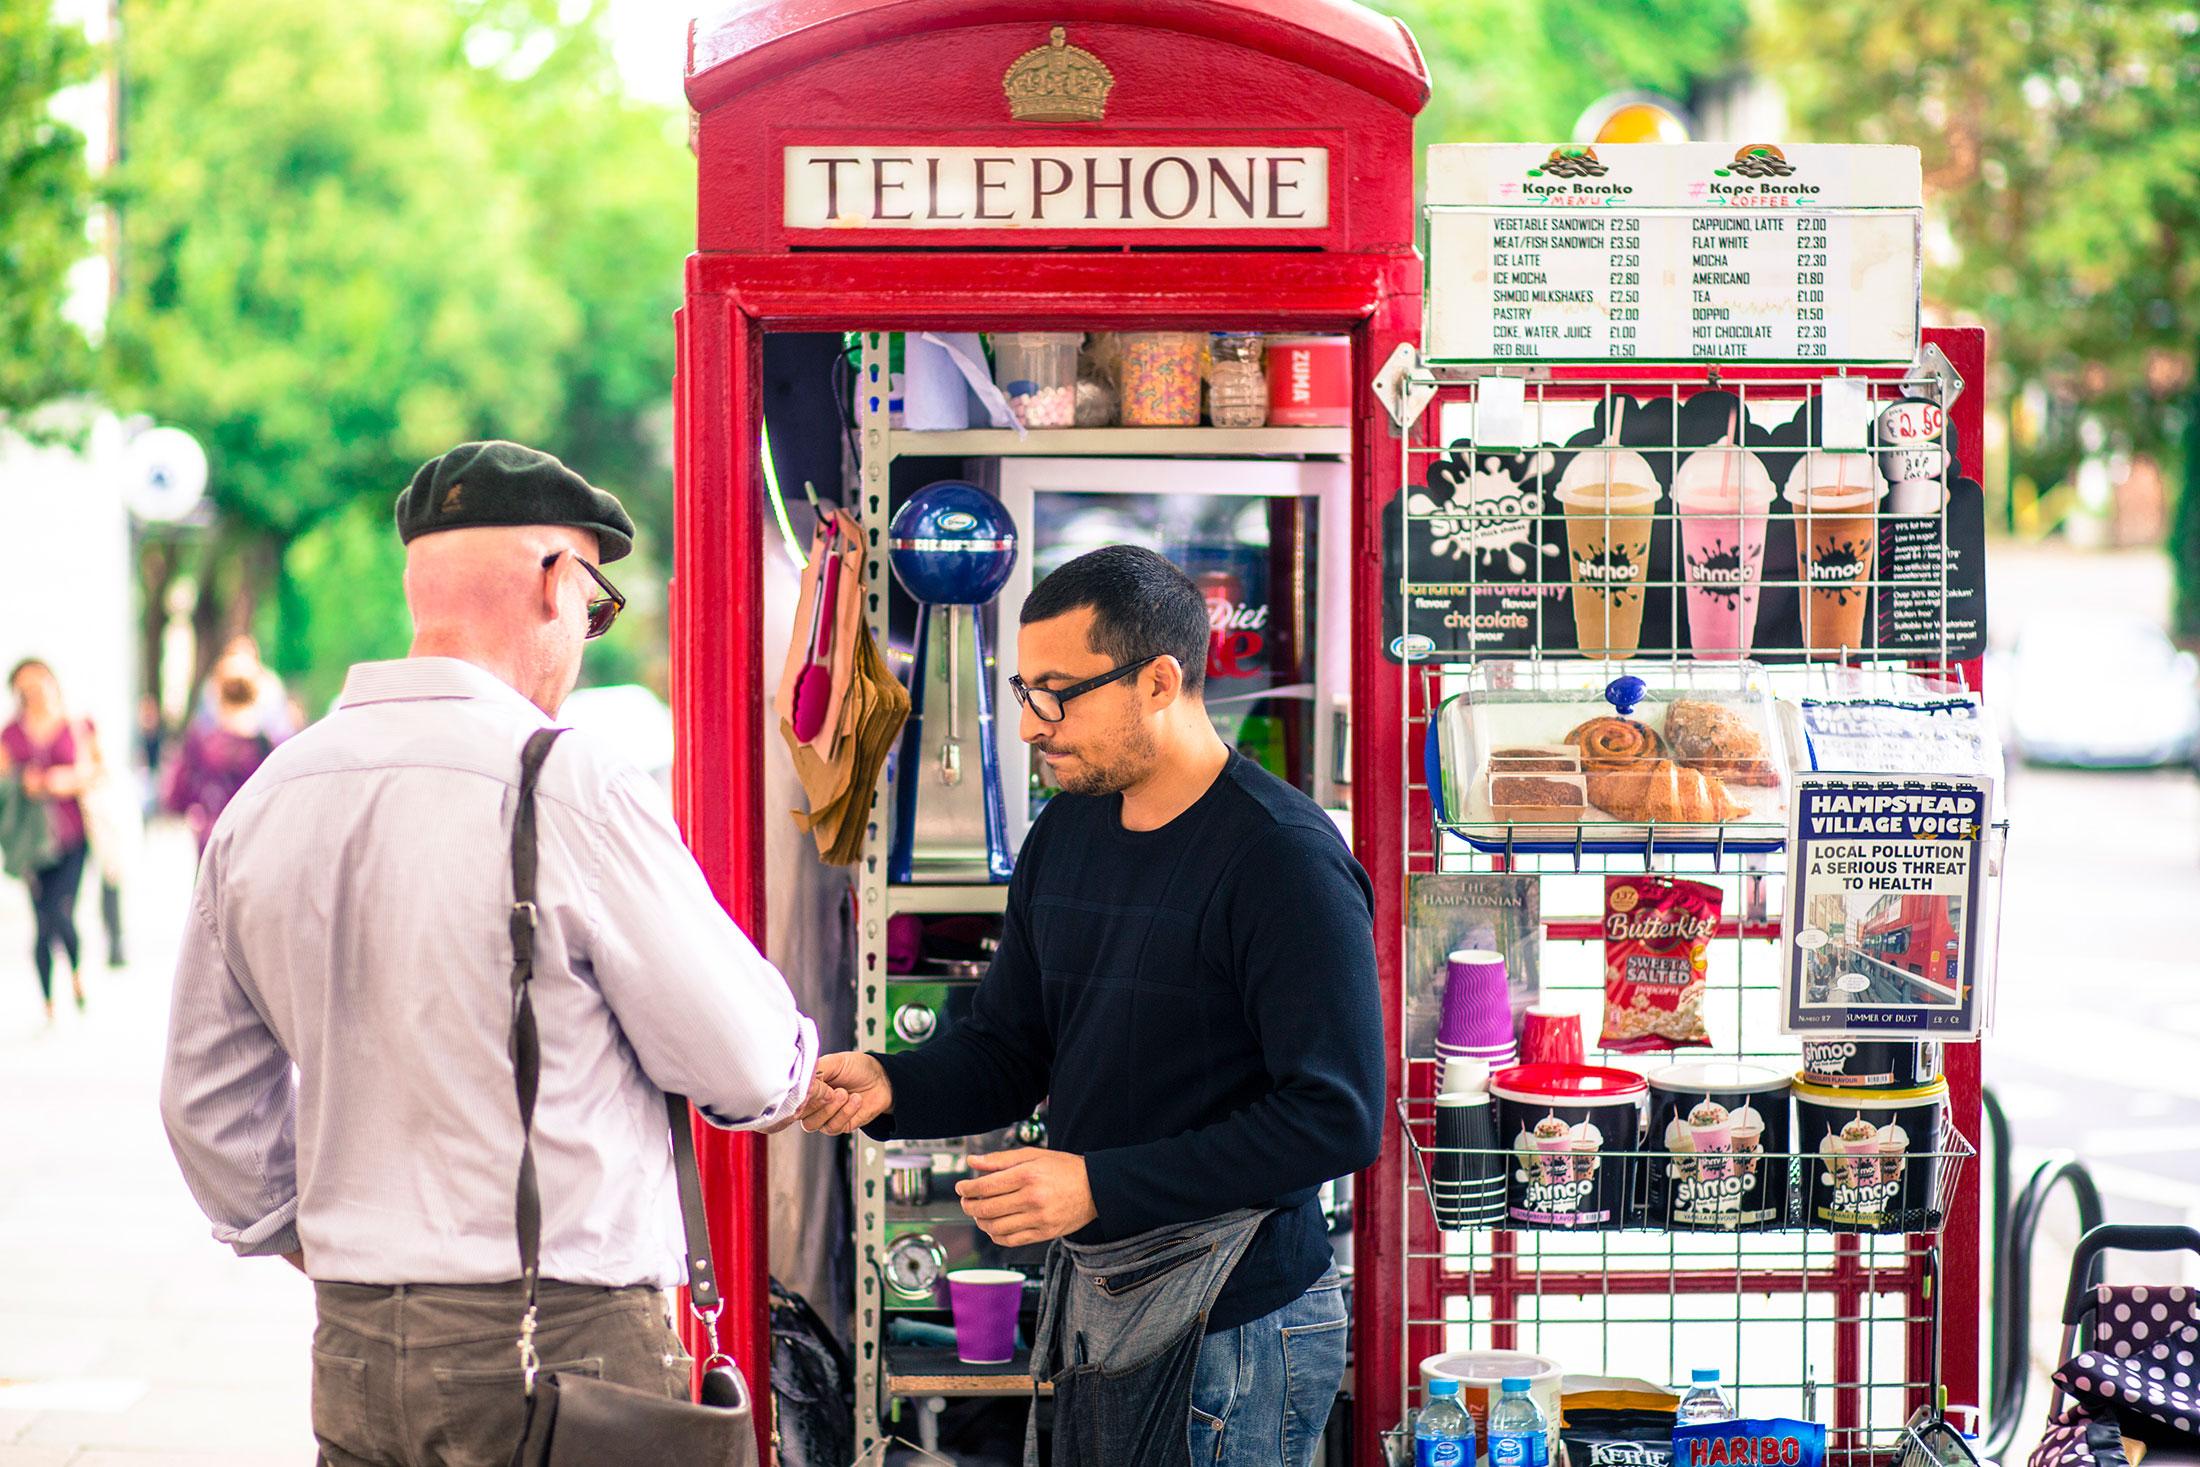 Umar Khalid, co-owner of the Kape Barako phone booth coffee stall, serves a customer.